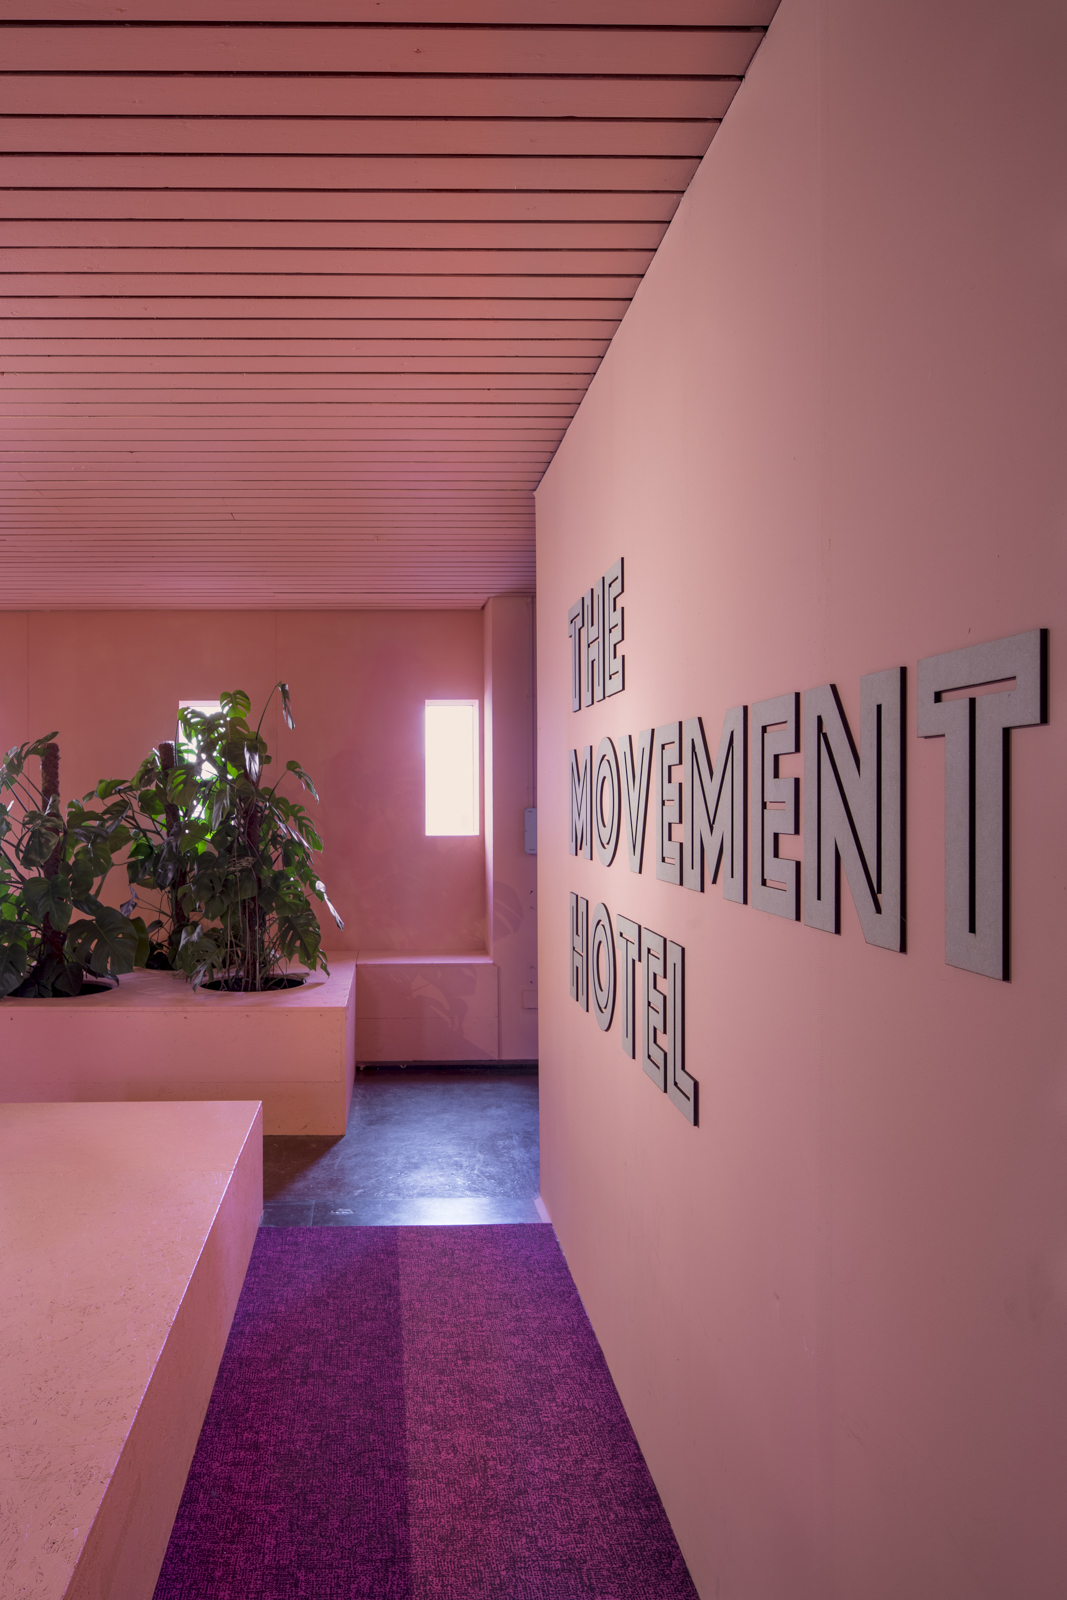 <p>The Movement Hotel in de Bijlmerbajes door ÈMCÉ interior architecture (Foto:  Wouter van der Sar en ÈMCÉ interior architecture)</p>